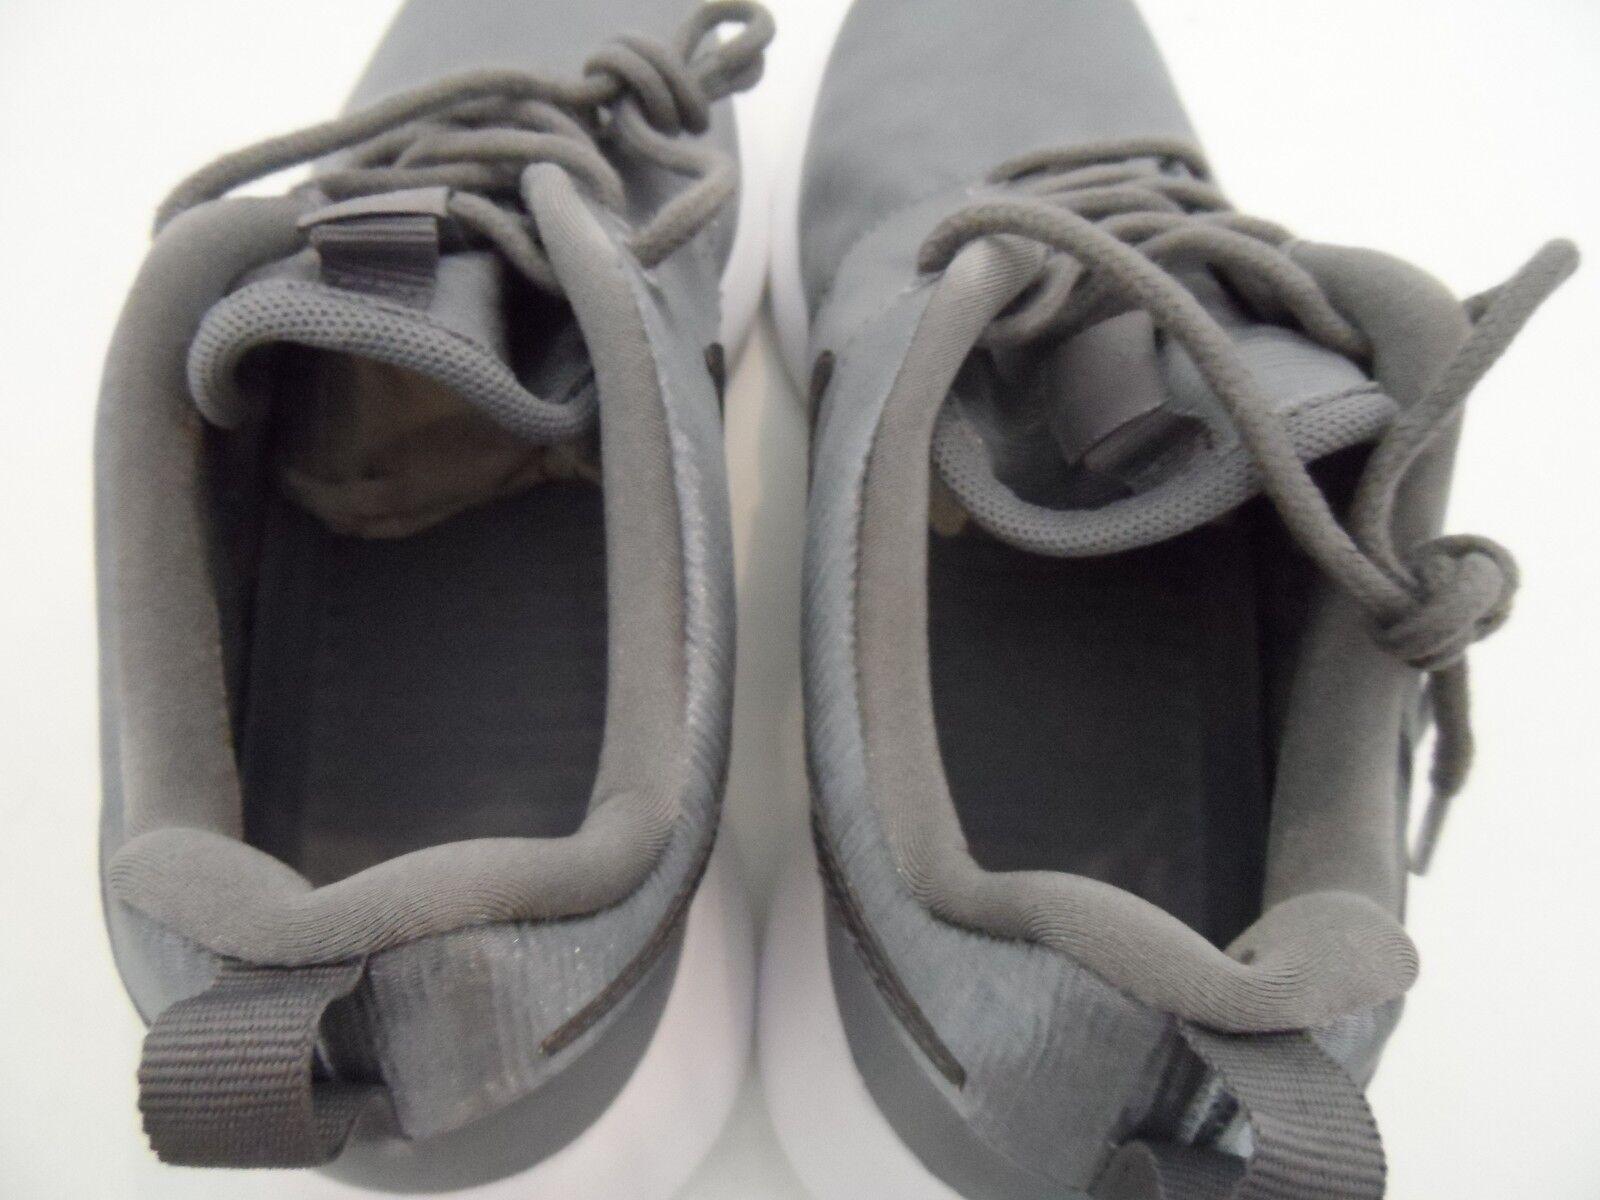 46f6fbc4cbd ... Nike Women s Roshe One PRM Running Shoes Shoes Shoes Smoke Gray White  Size 7 d4b424